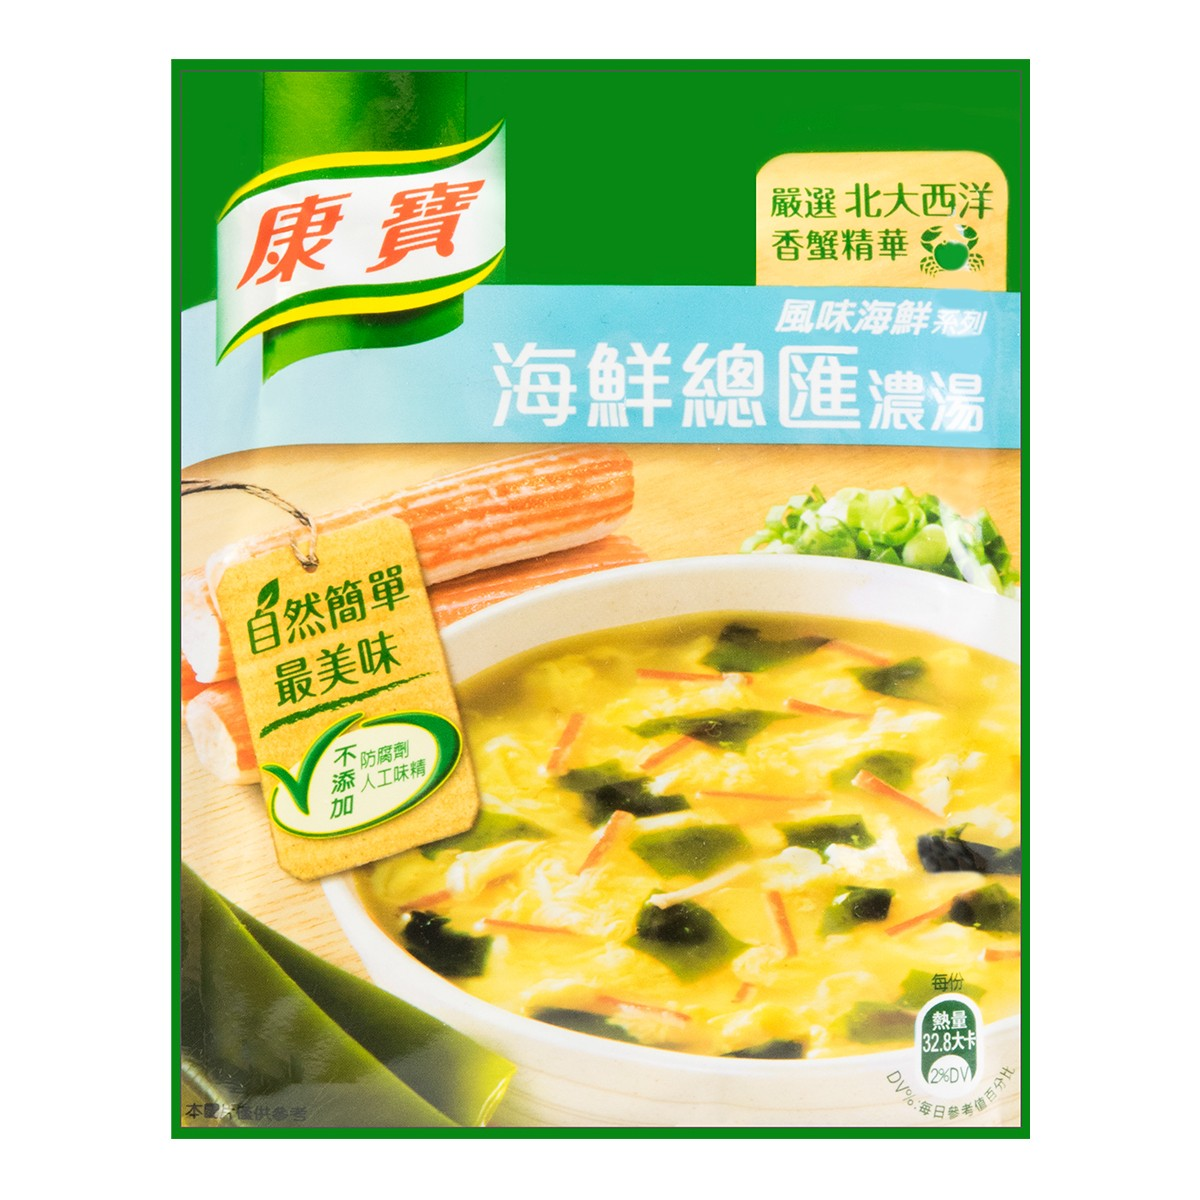 KNORR Seafood Series Seafood Soup 38.3g